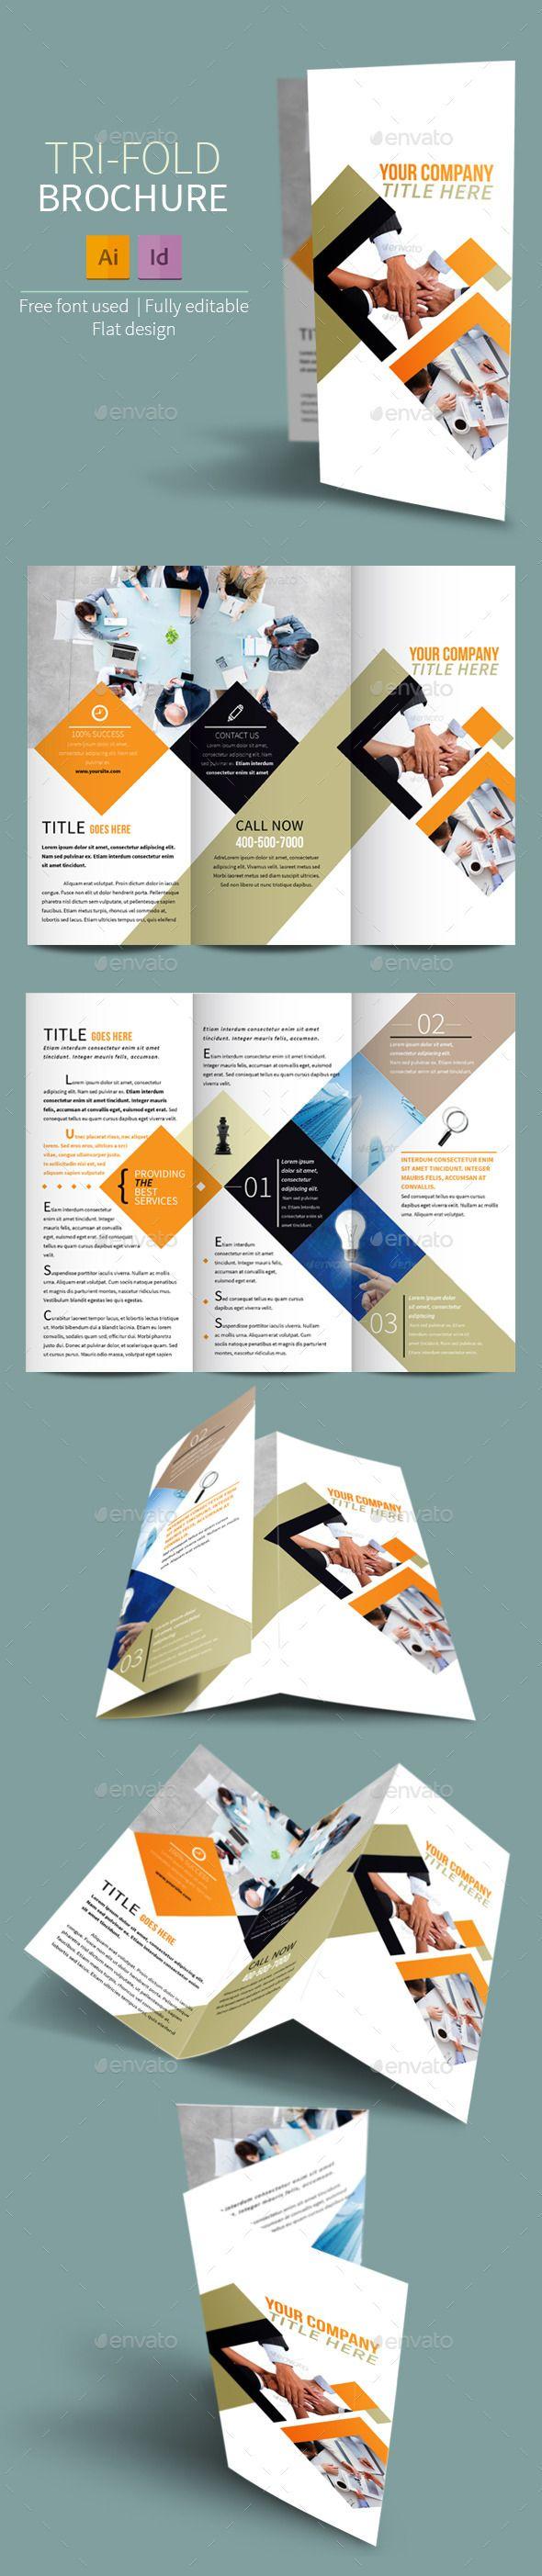 Best Brochure Template Images On Pinterest Brochures - Informational brochure template